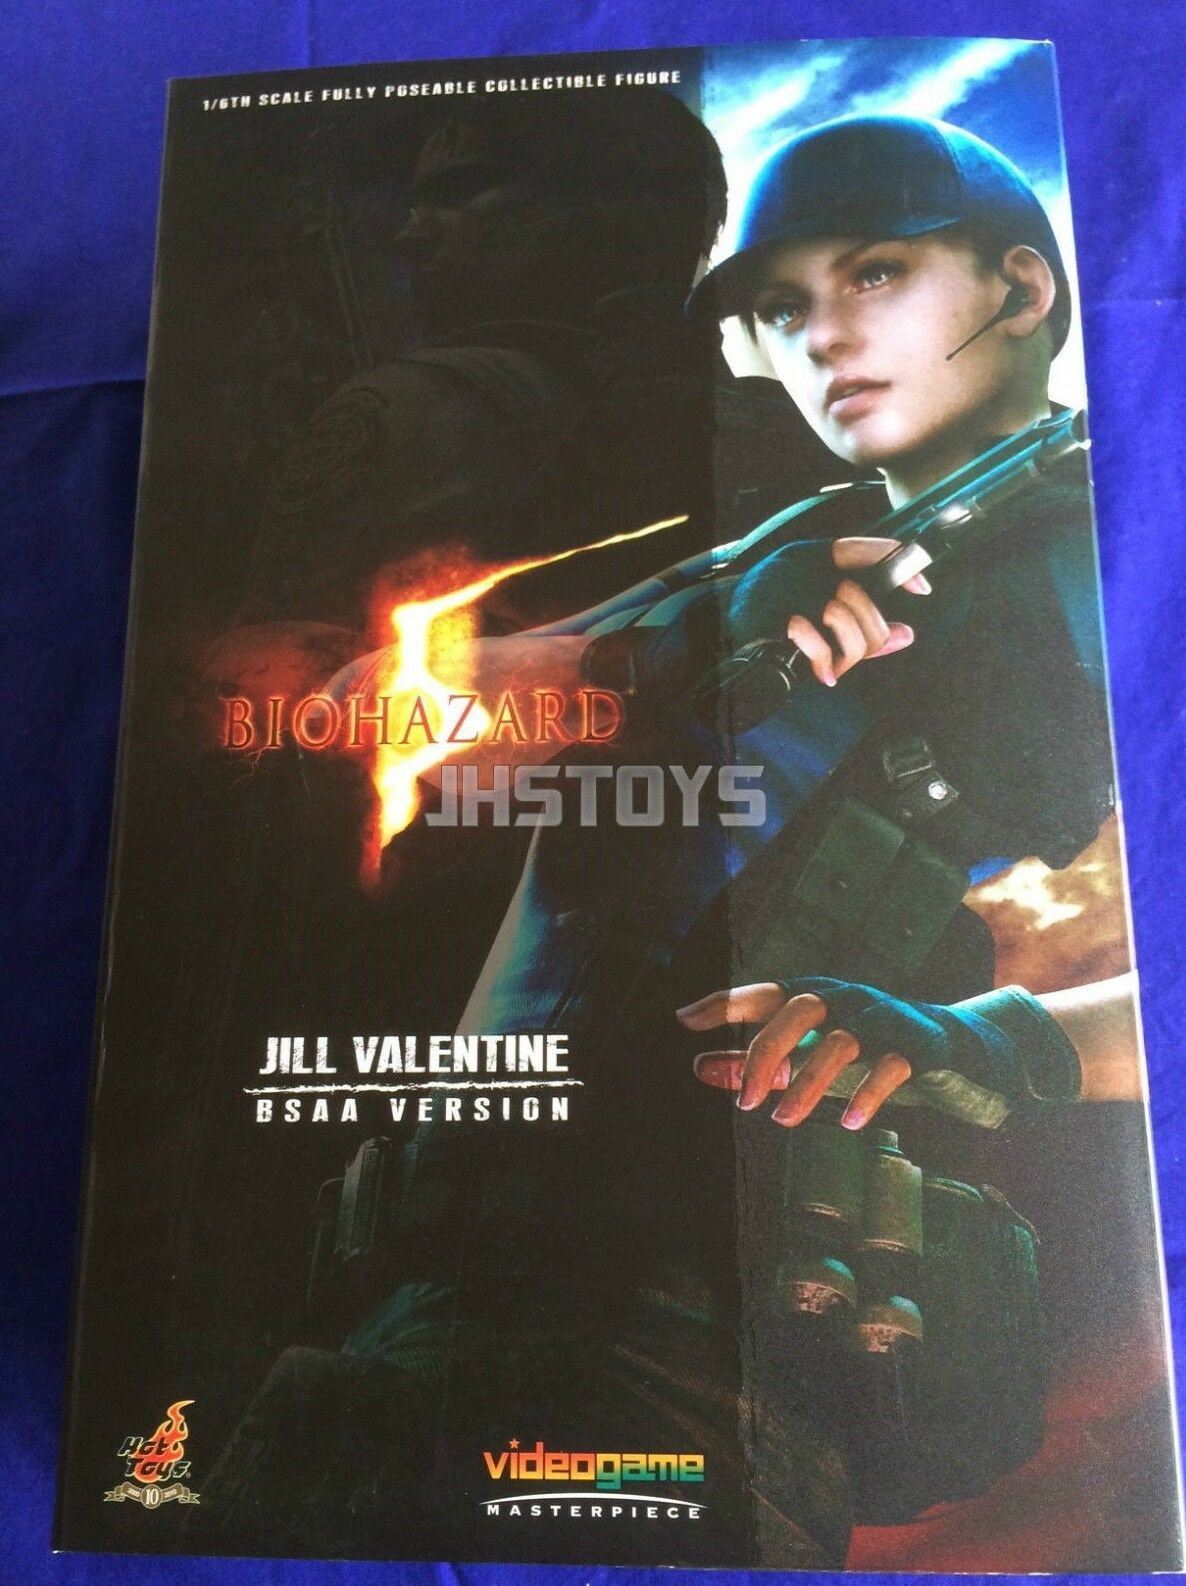 Hot Toys 1/6 Resident Evil Biohazard 5 Jill Valentine BSAA Version VGM11 Japan